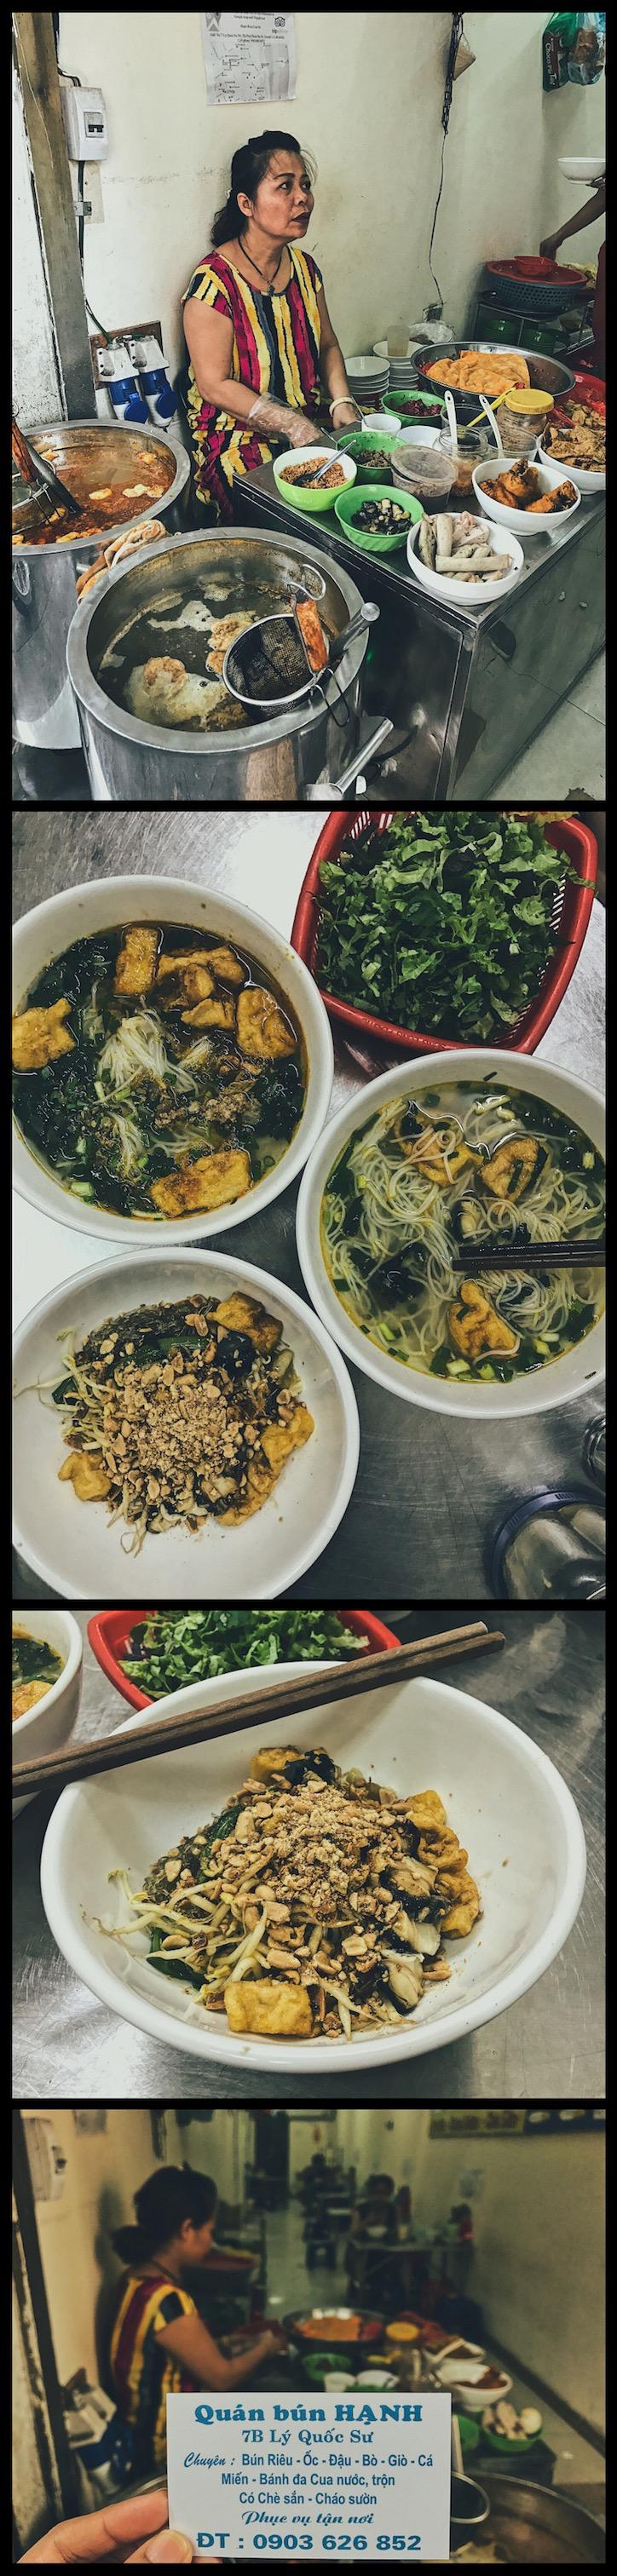 Snail Vermicelli Soup Bun Oc Hanoi Vietnamese Food Guide